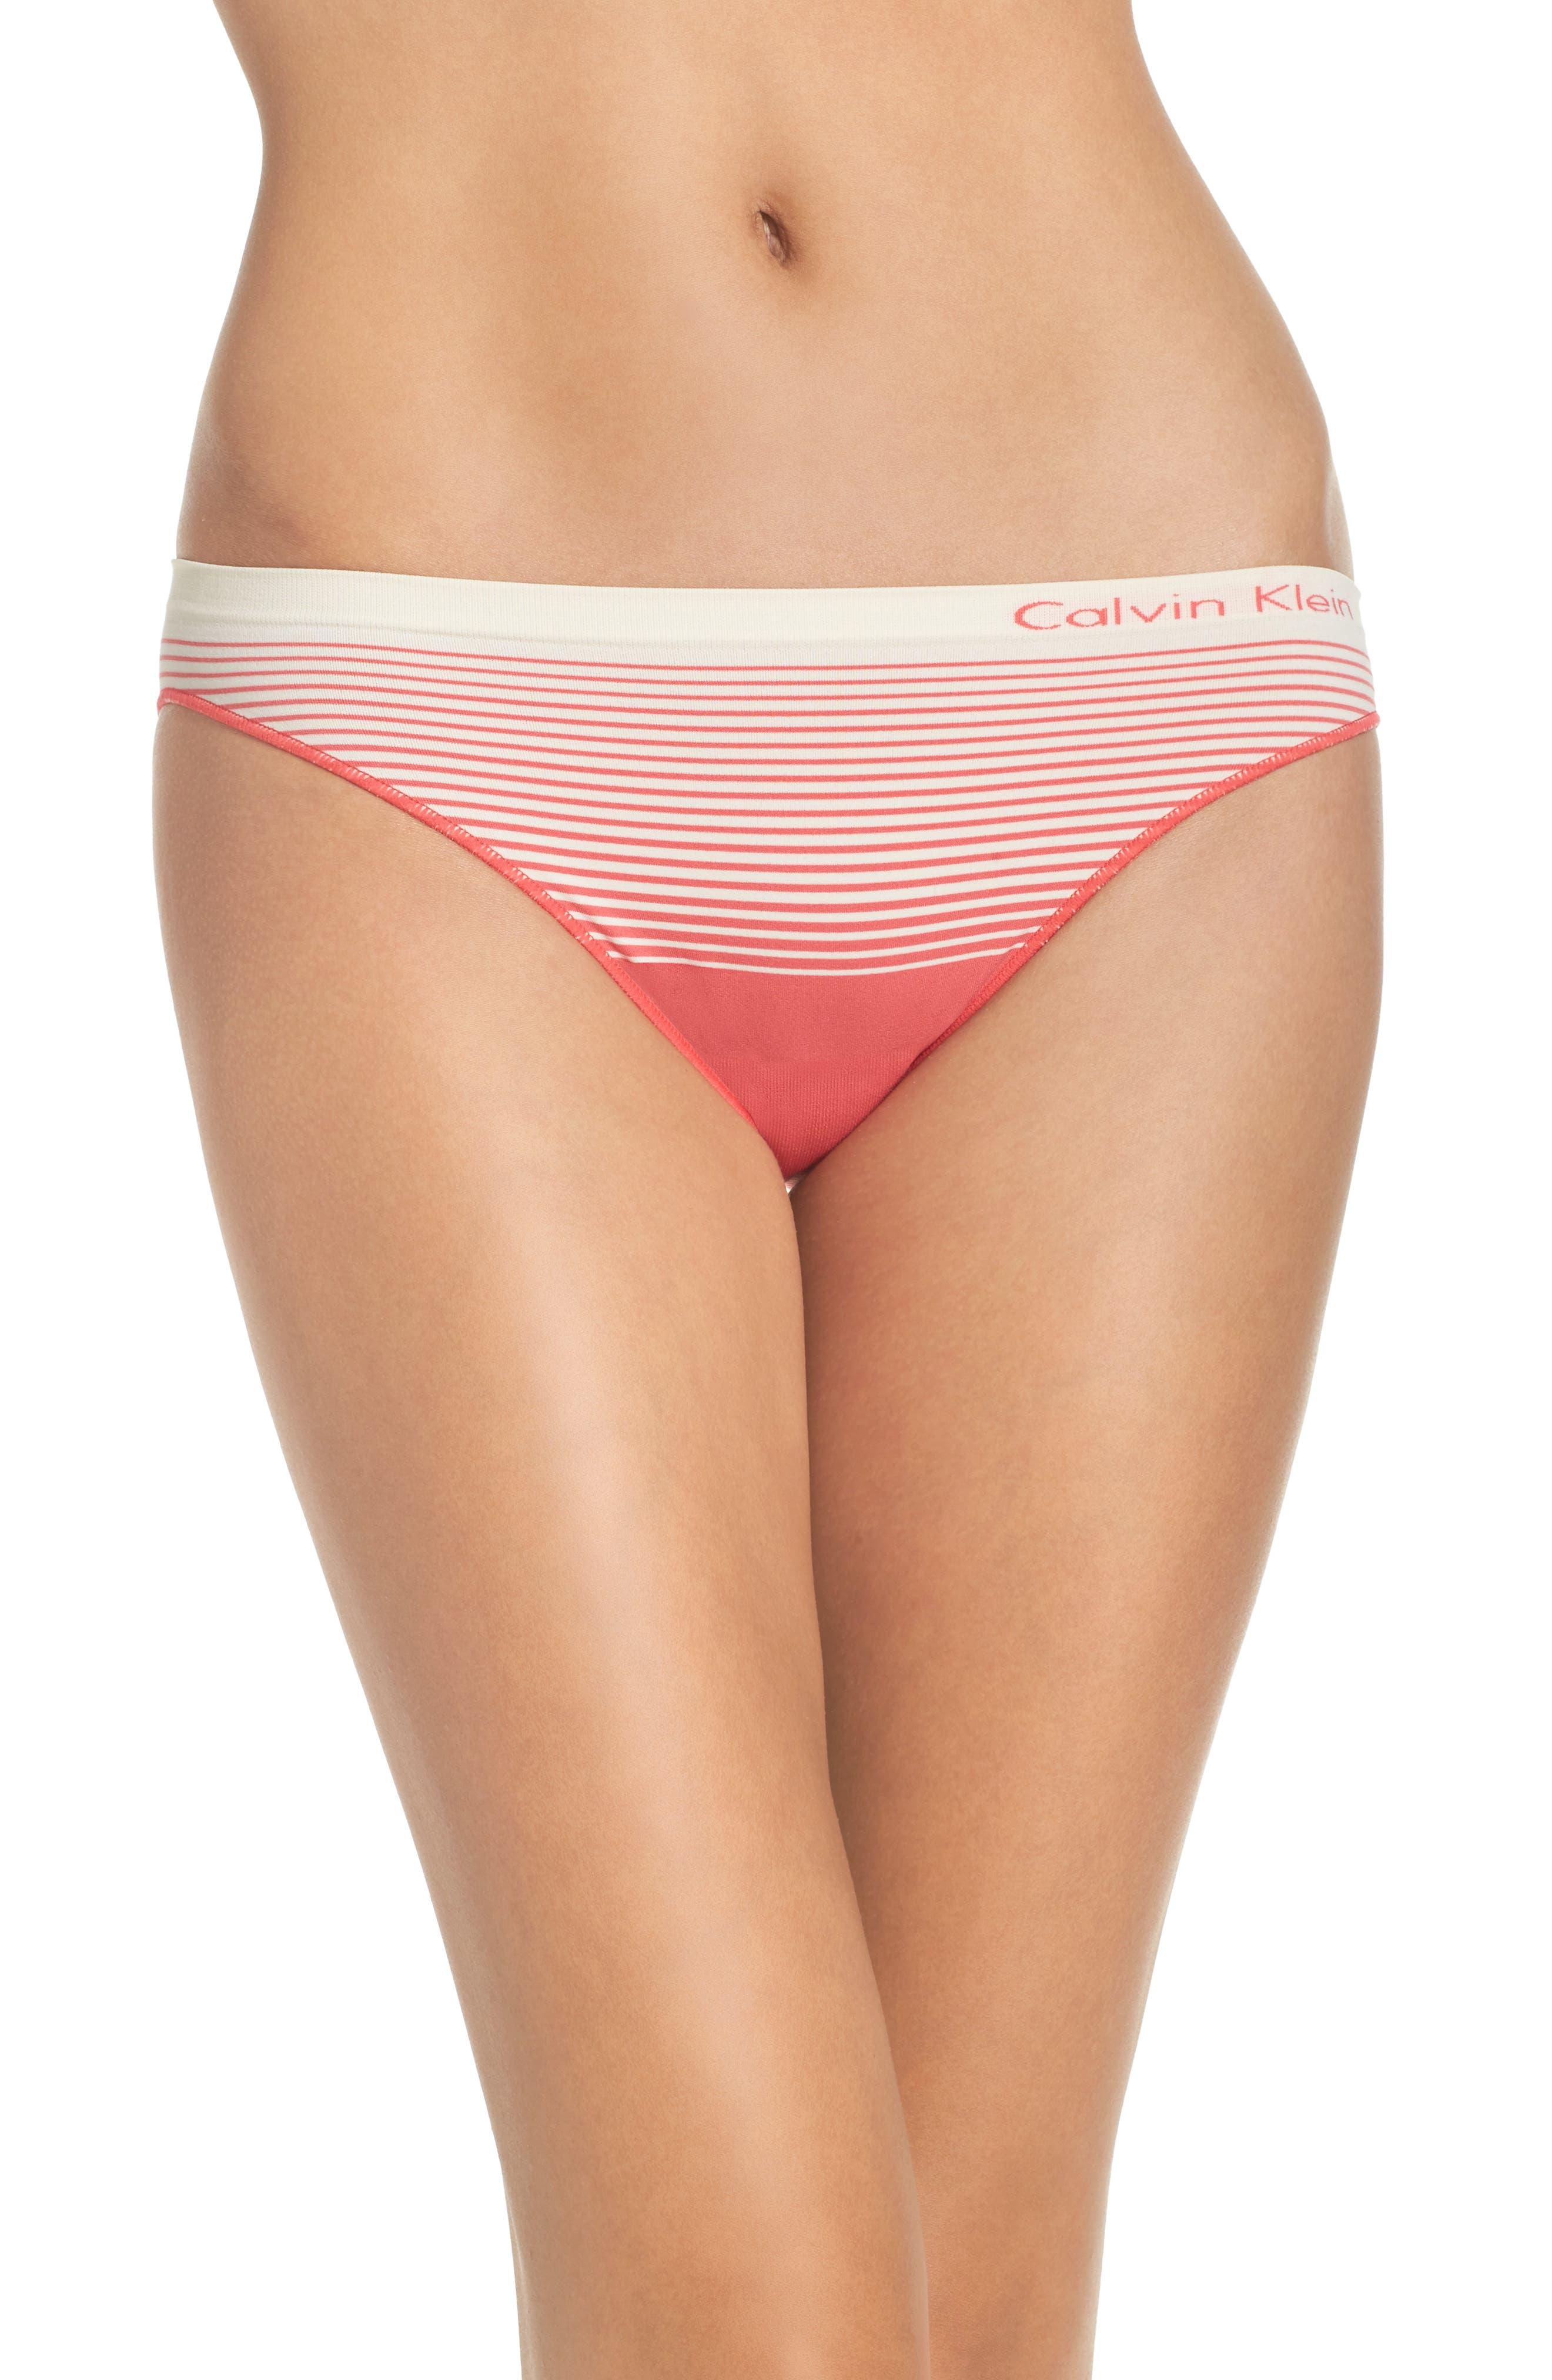 CALVIN KLEIN Illusion Seamless Bikini Briefs